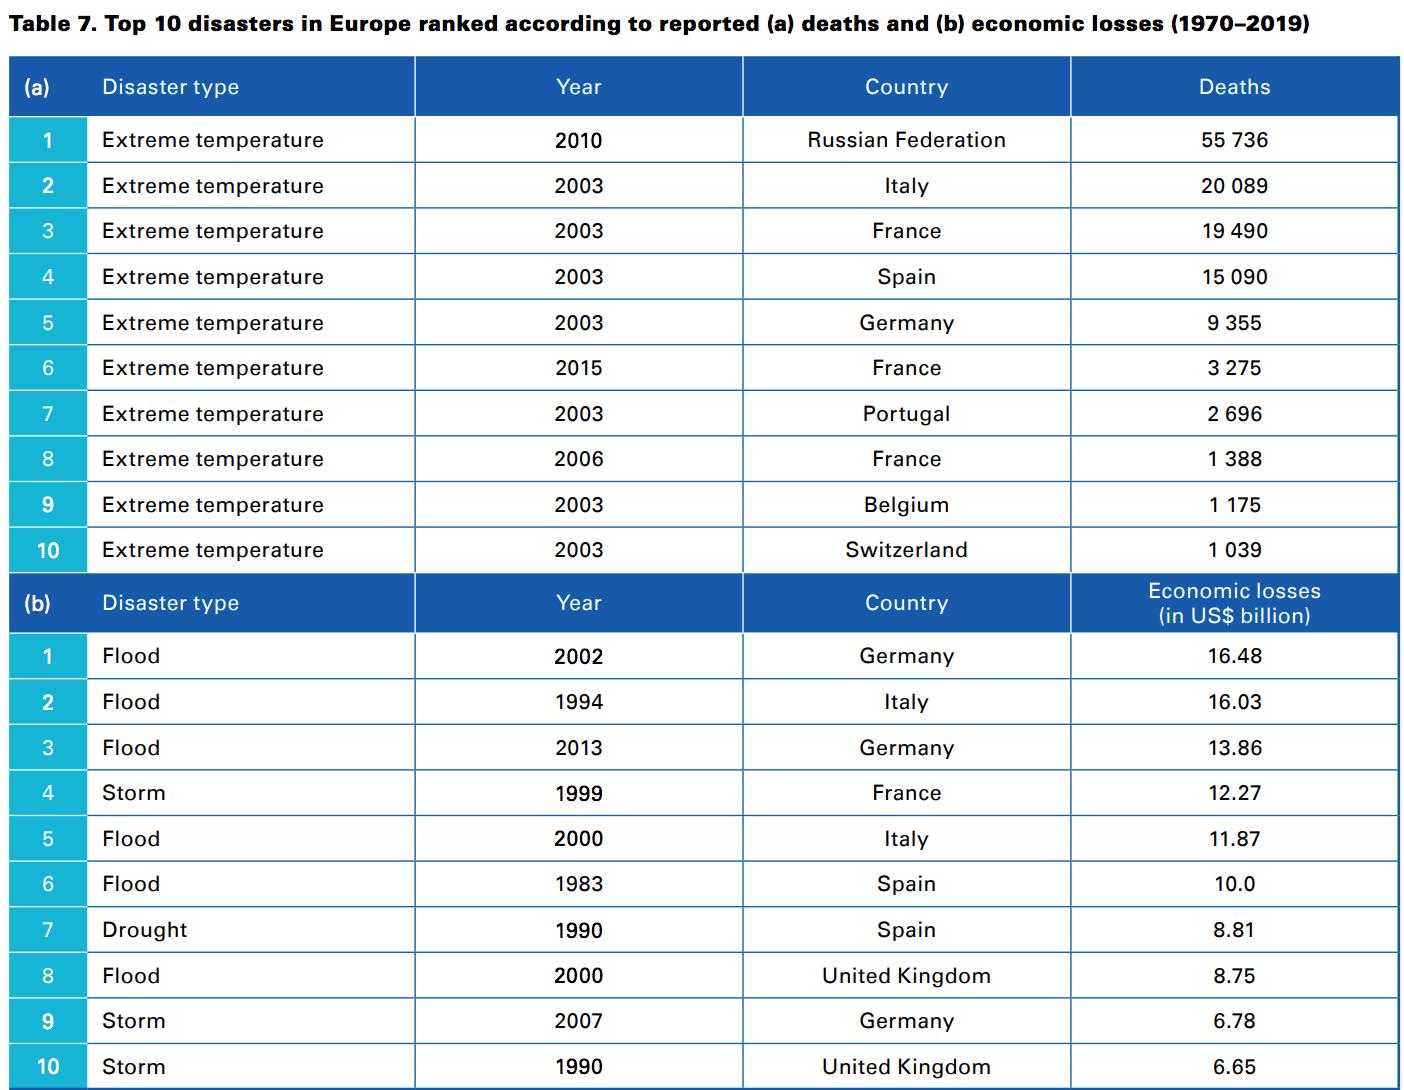 Top 10 disasters in Europe